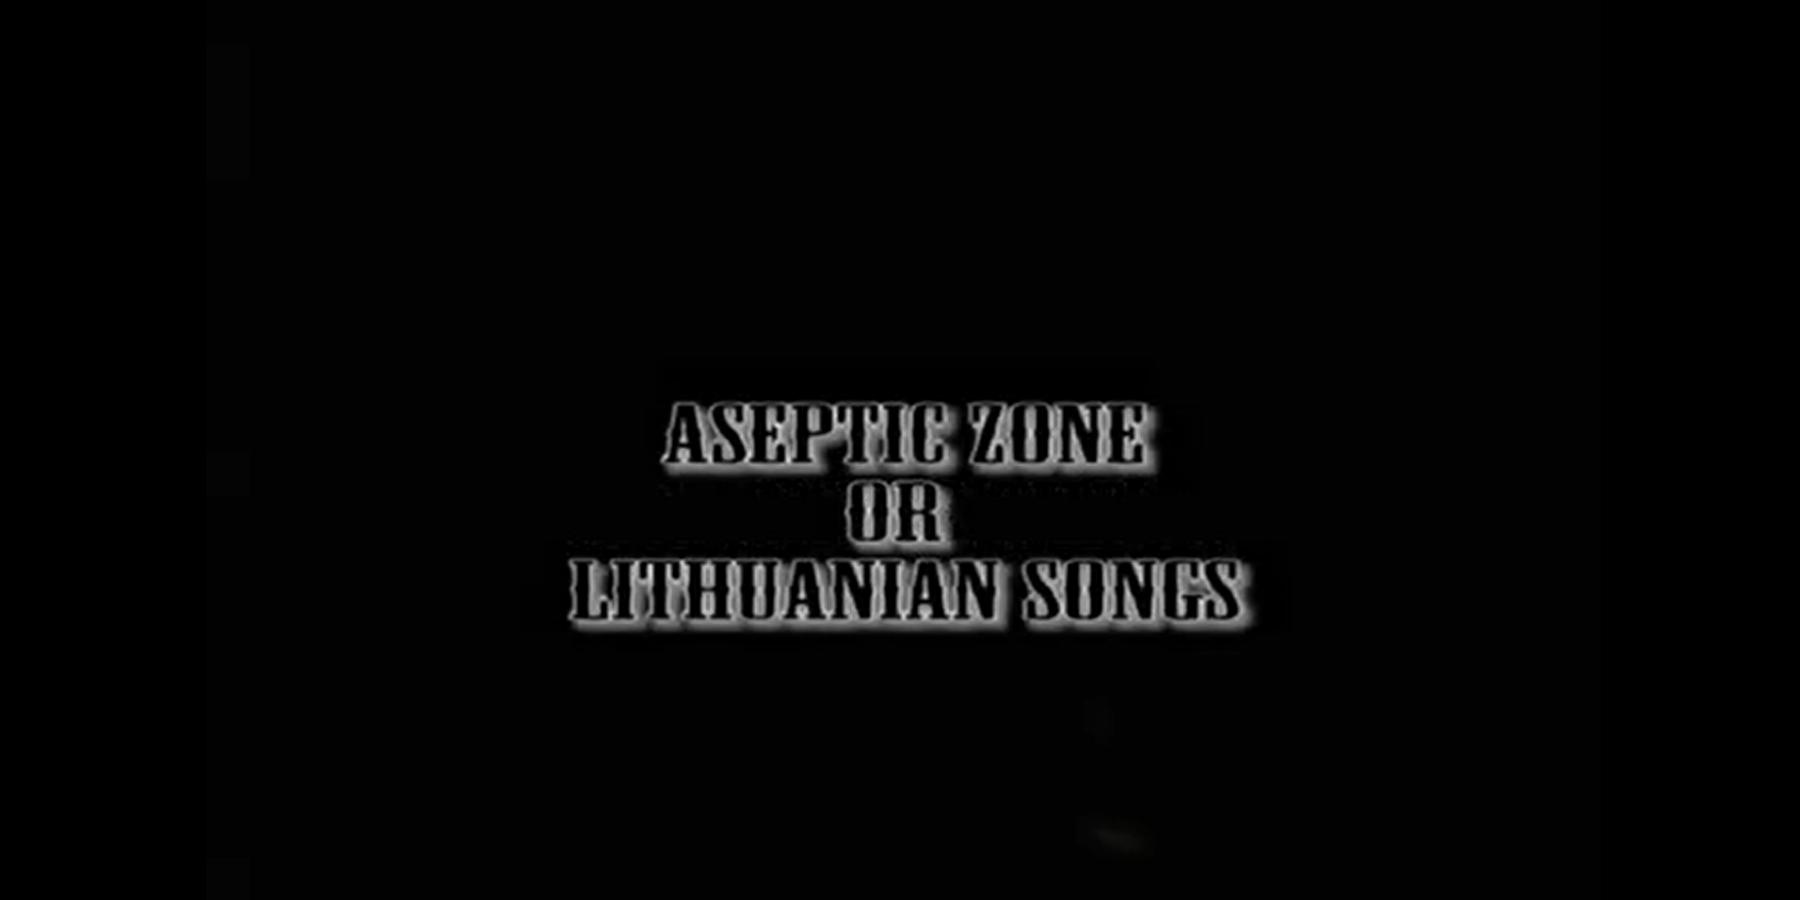 aseptine zona